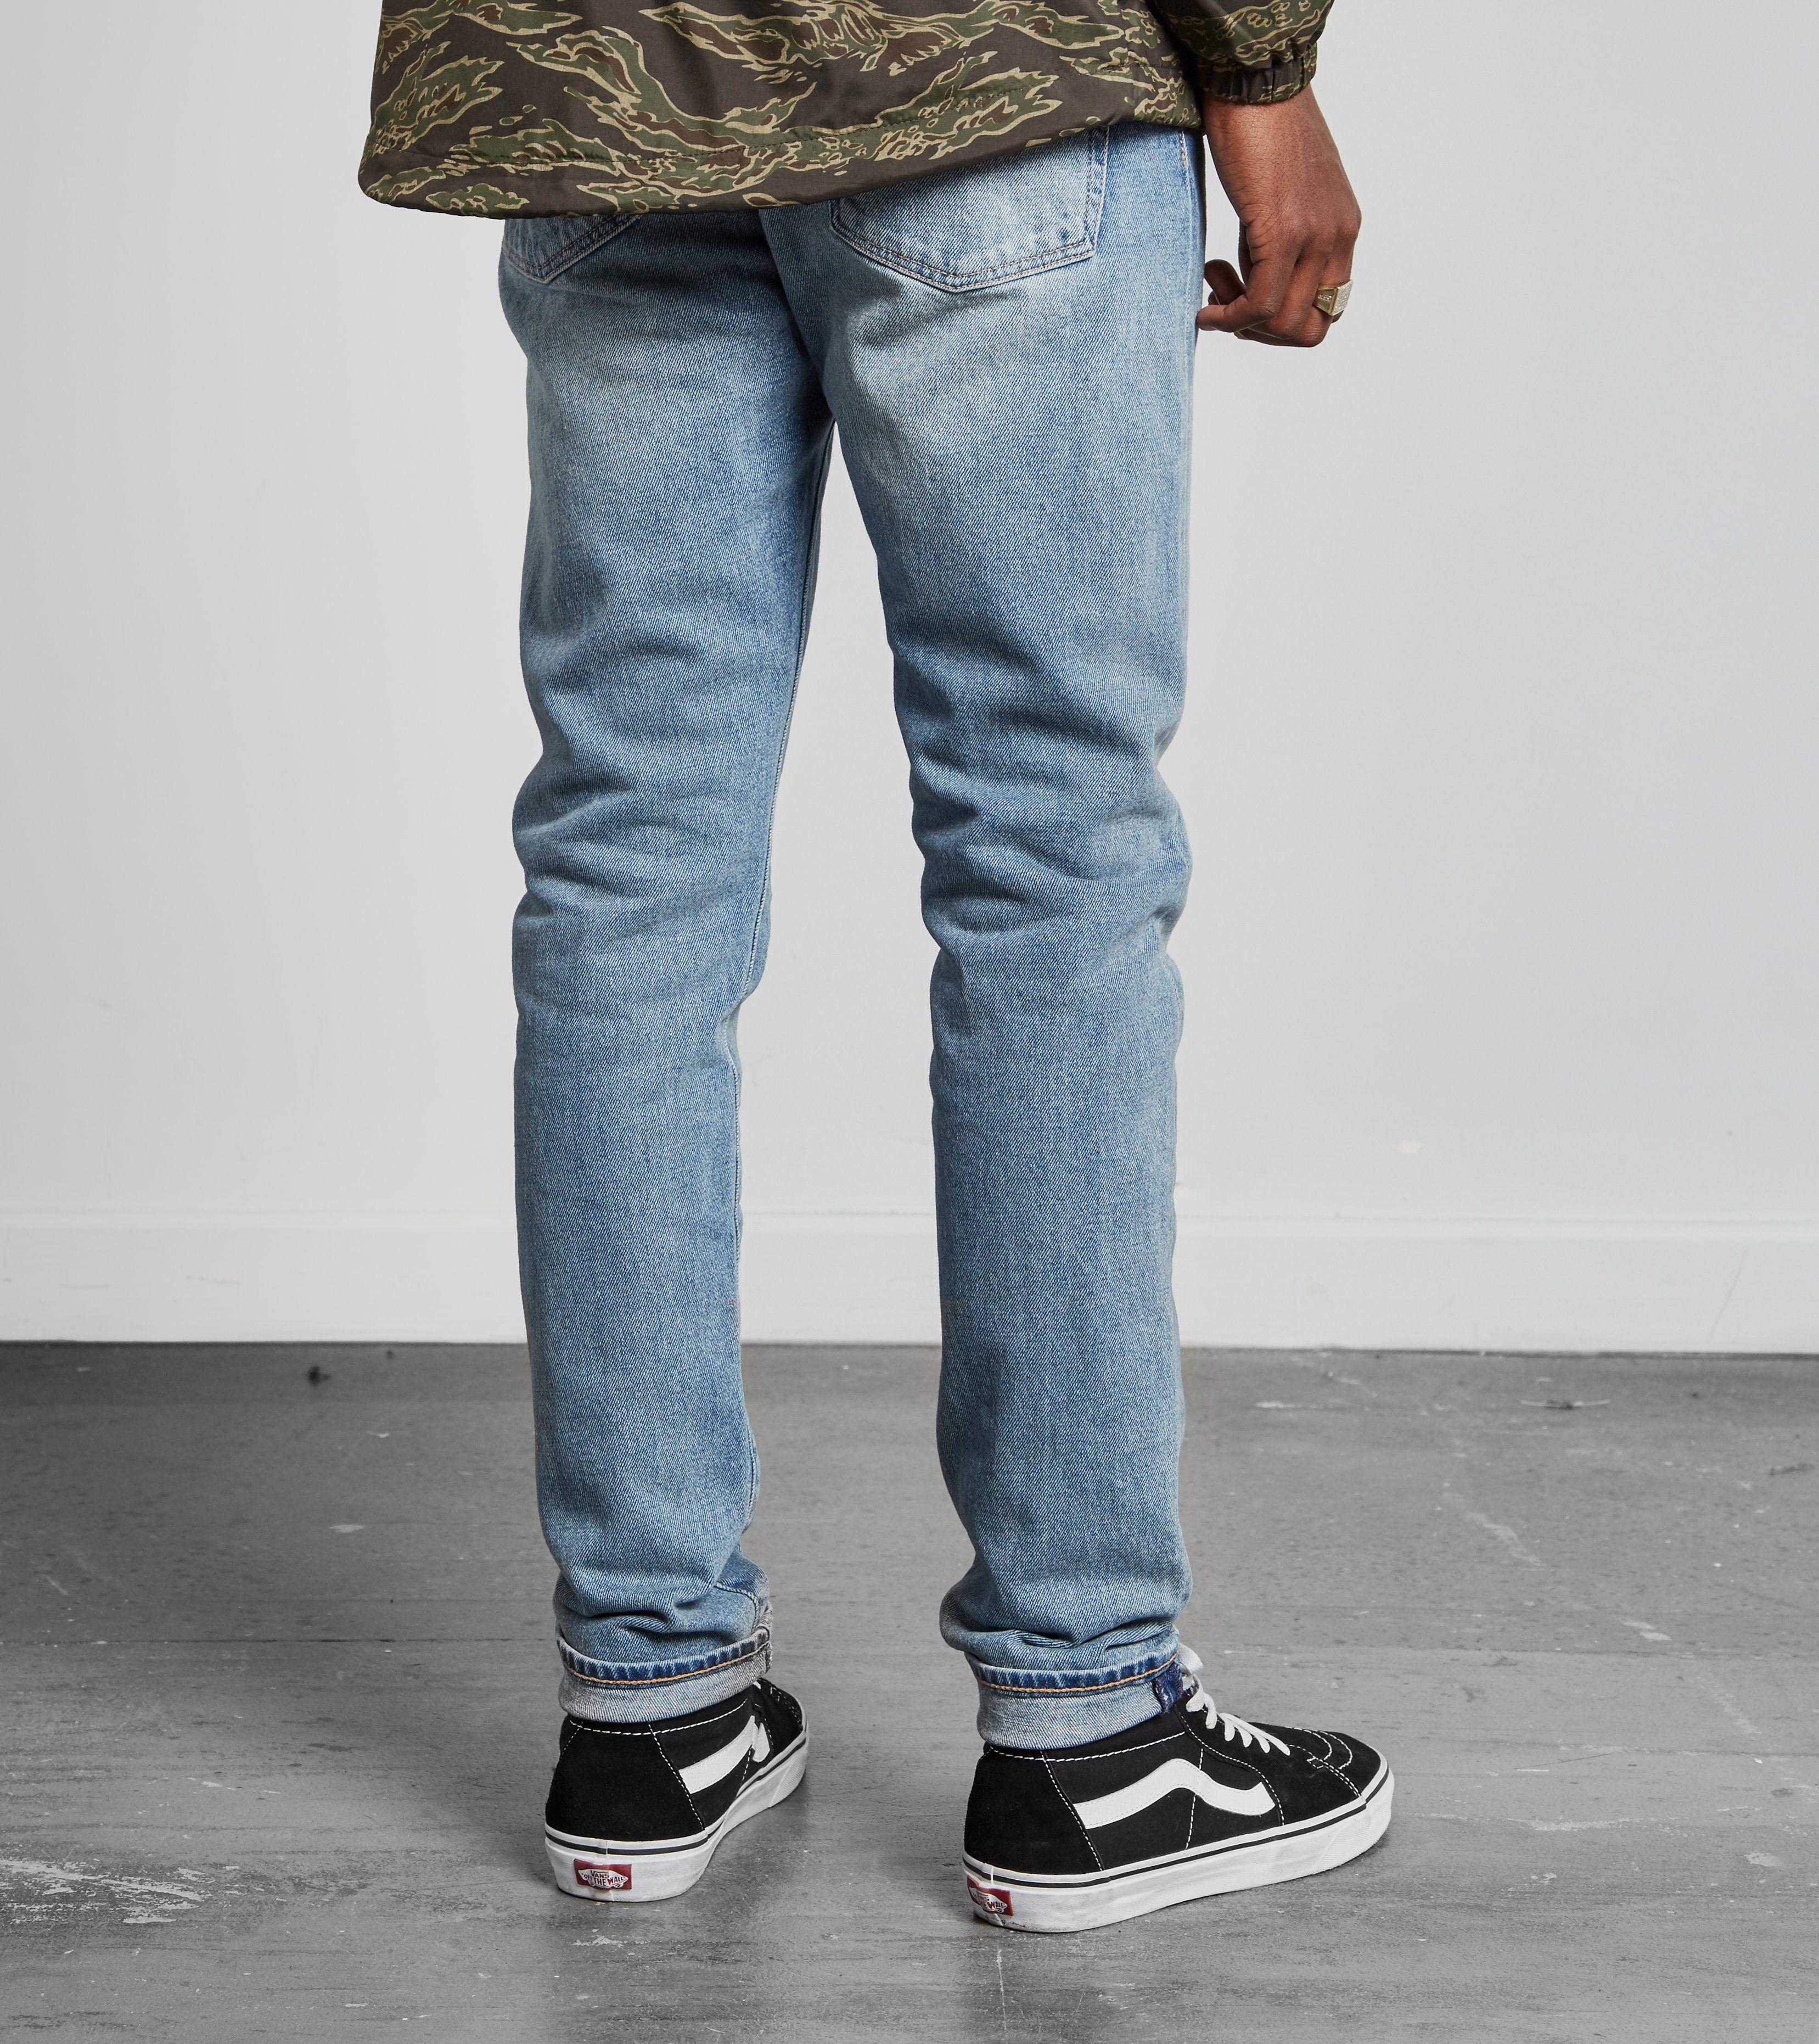 levis 510 skinny jeans size